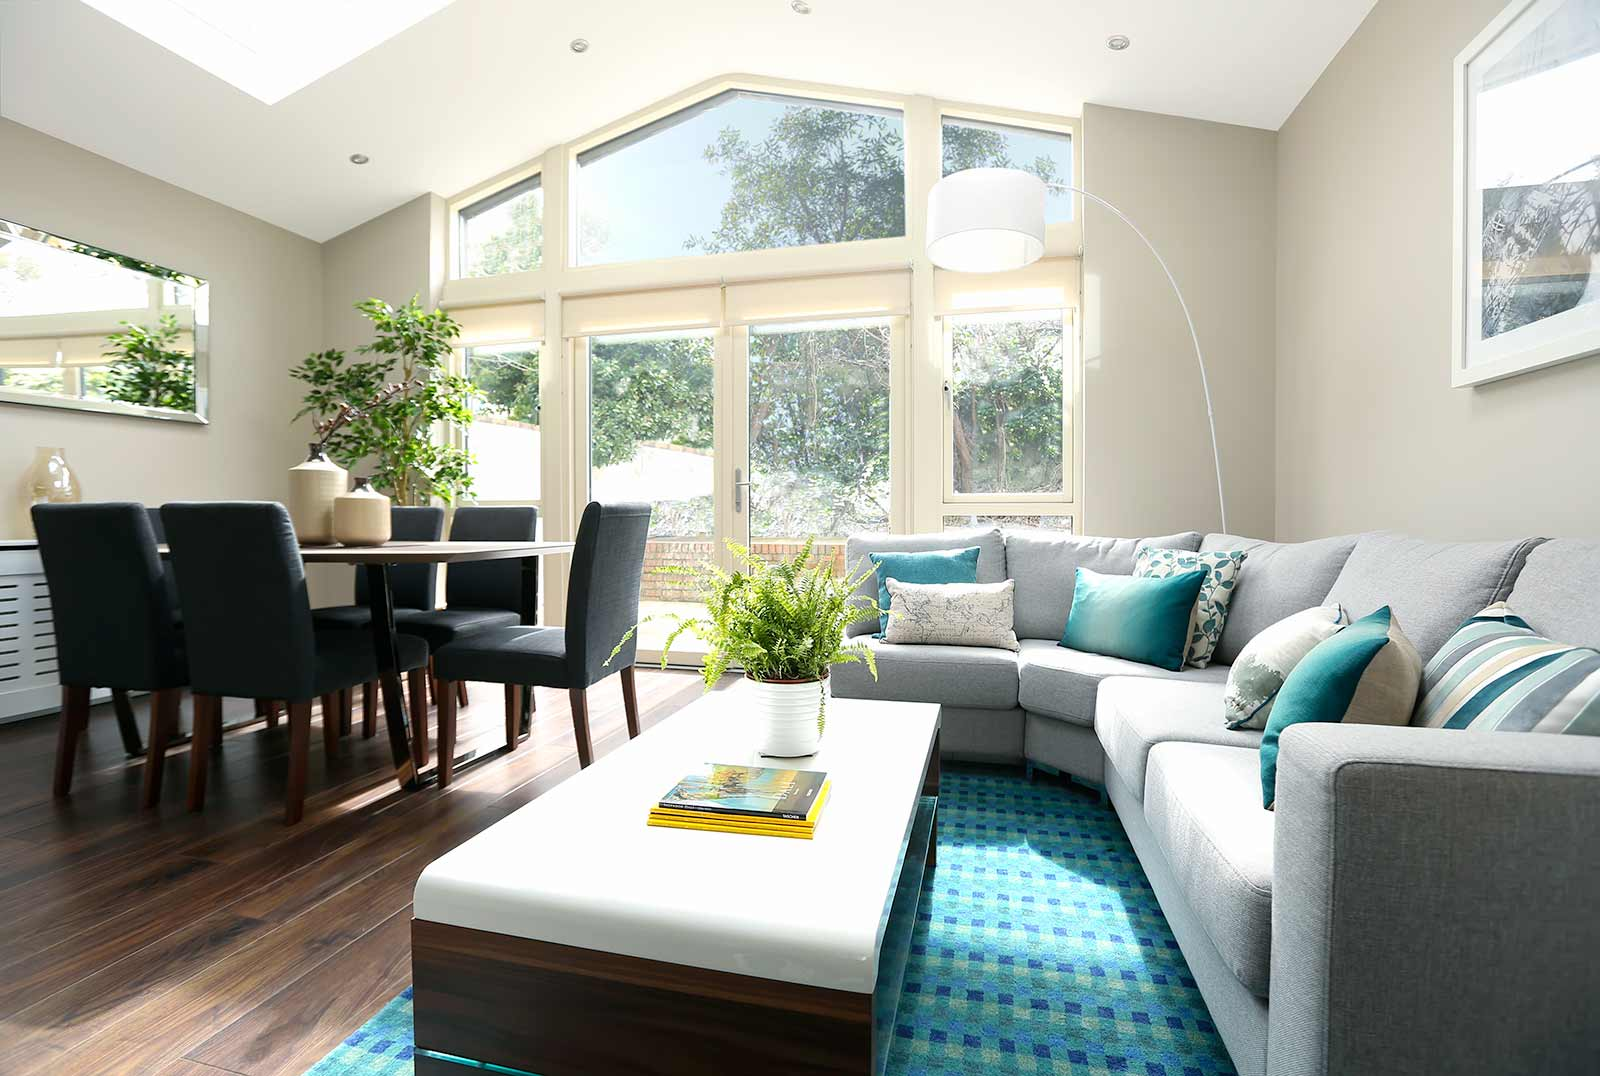 Carton-Interiors_P8_2_Open-plan-kitchen-living-room